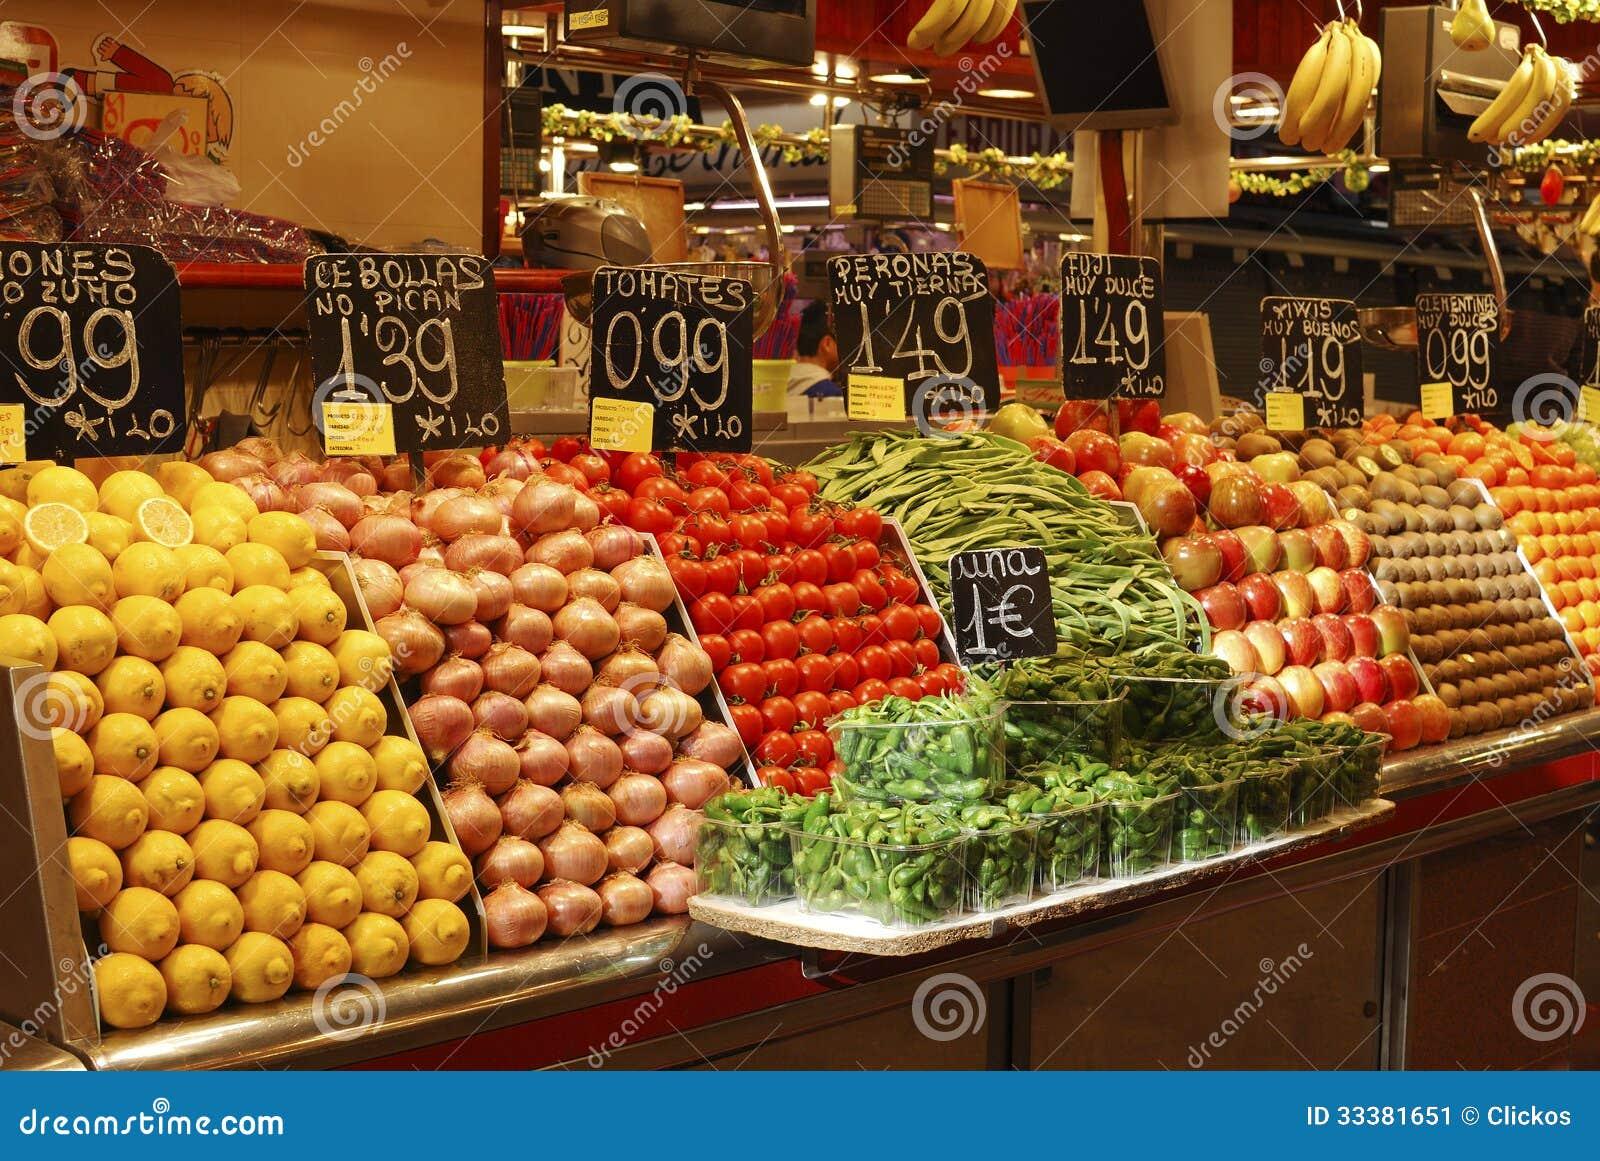 display fruit market stall barcelona spain stock images download